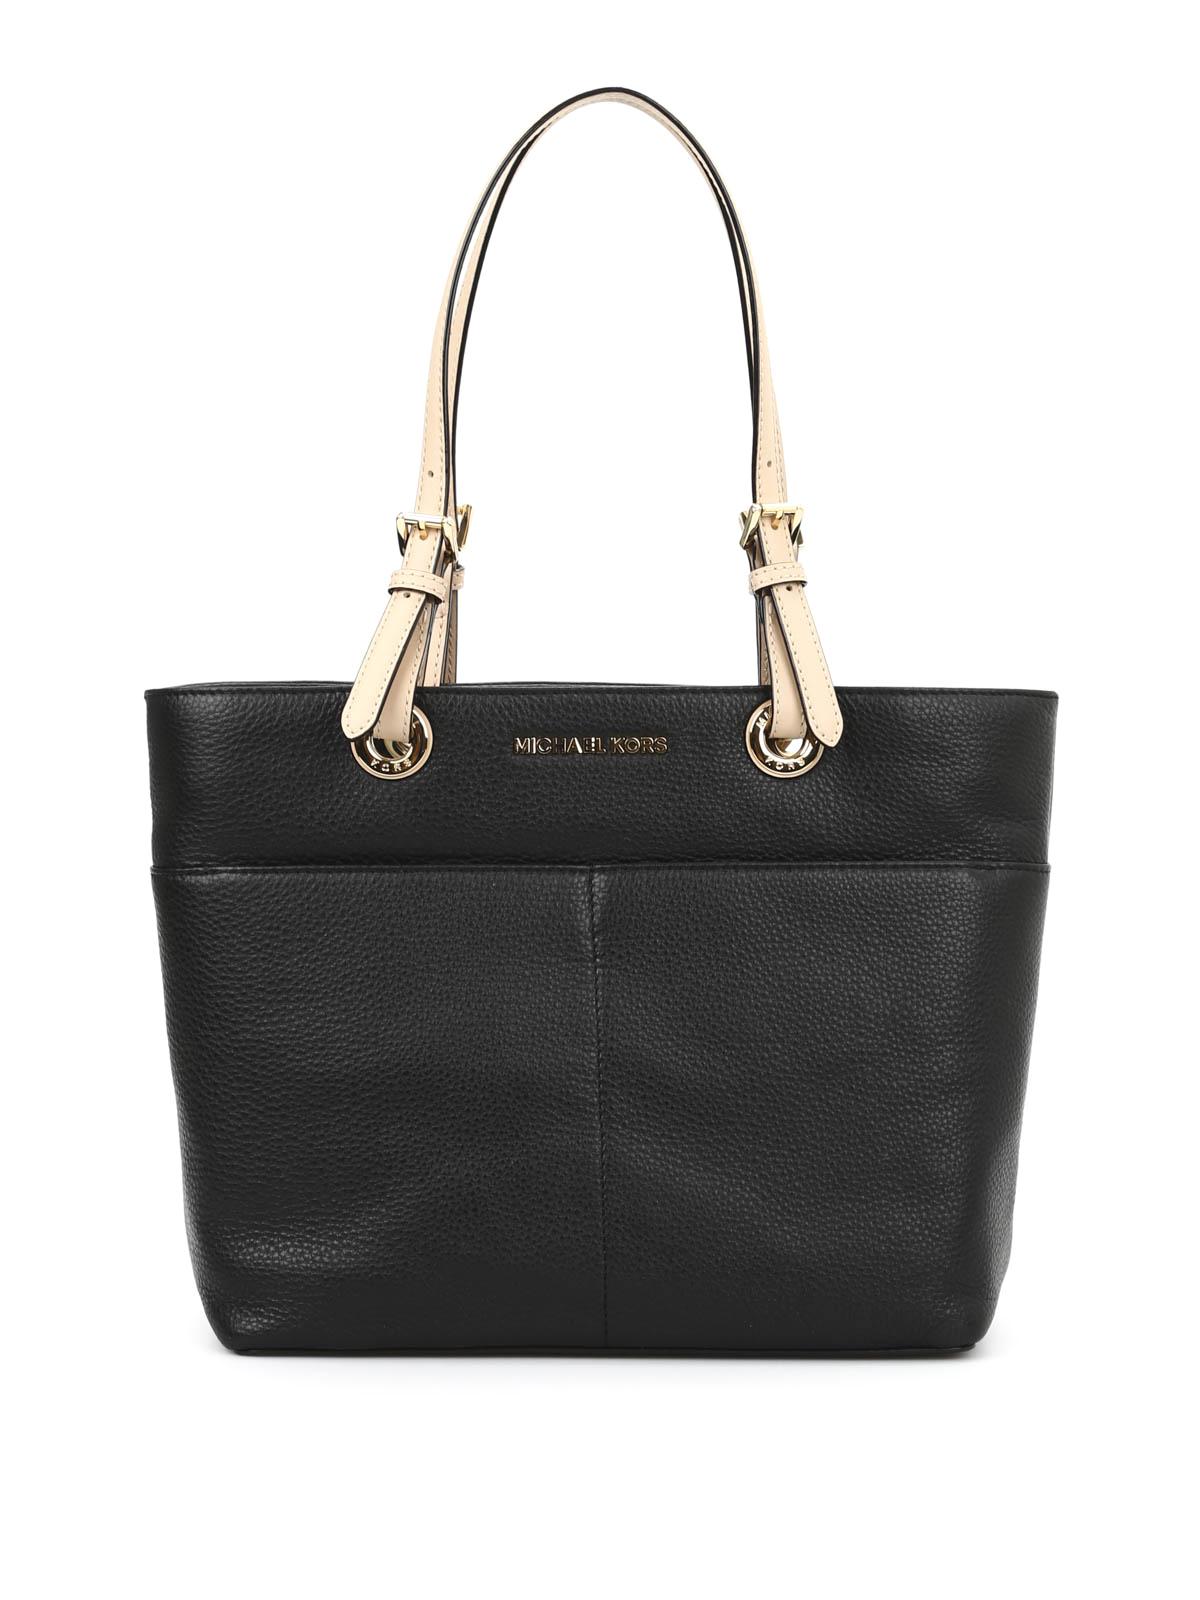 c596e947ea38a ... low price michael kors handtaschen handtasche bedford schwarz b8f42  4e503